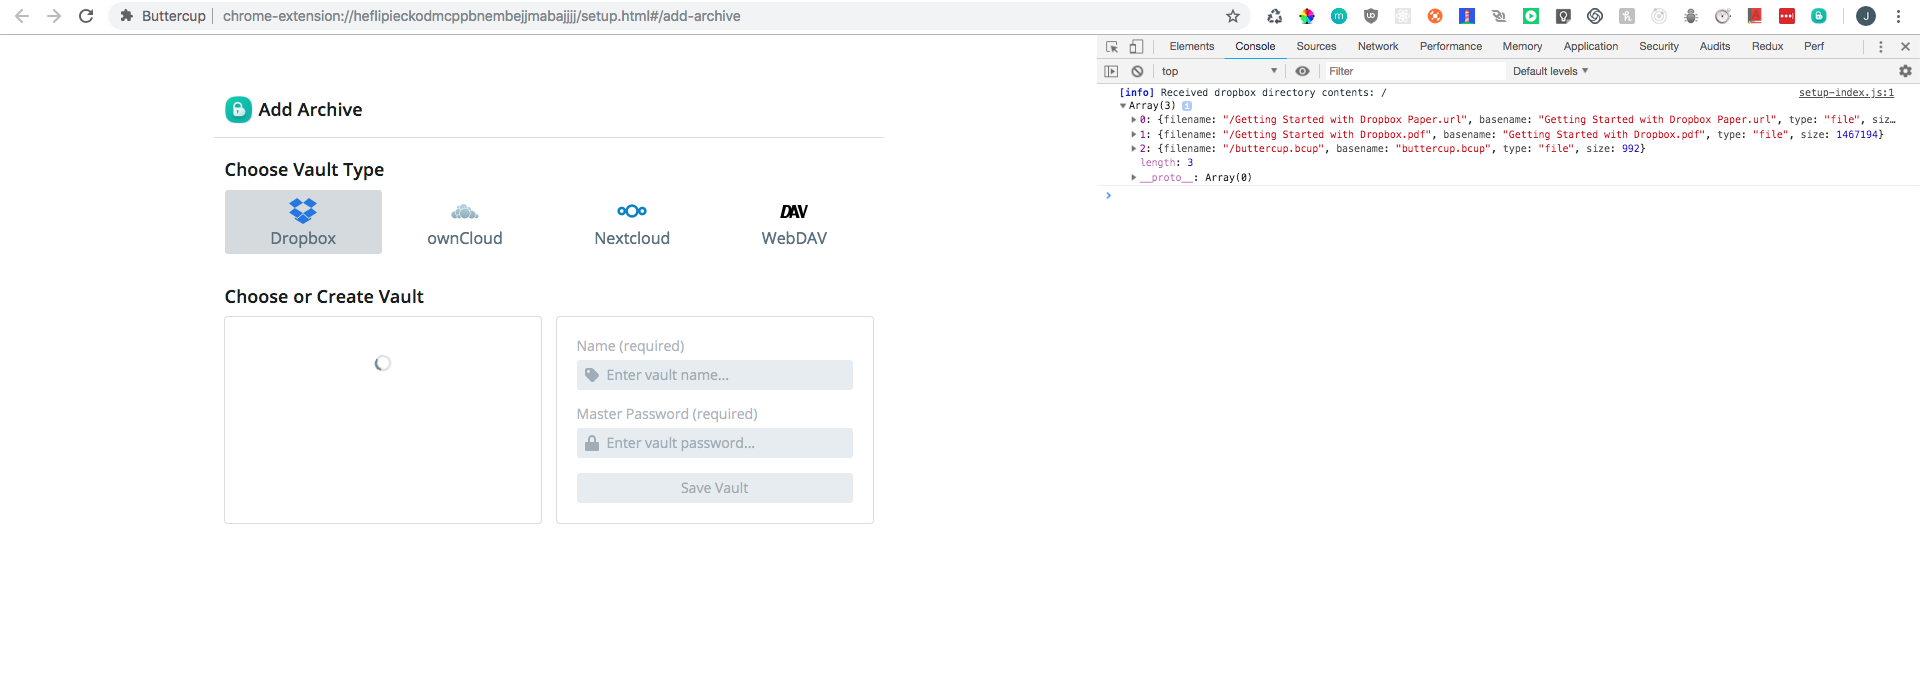 Dropbox connection never completes UI loading procedure